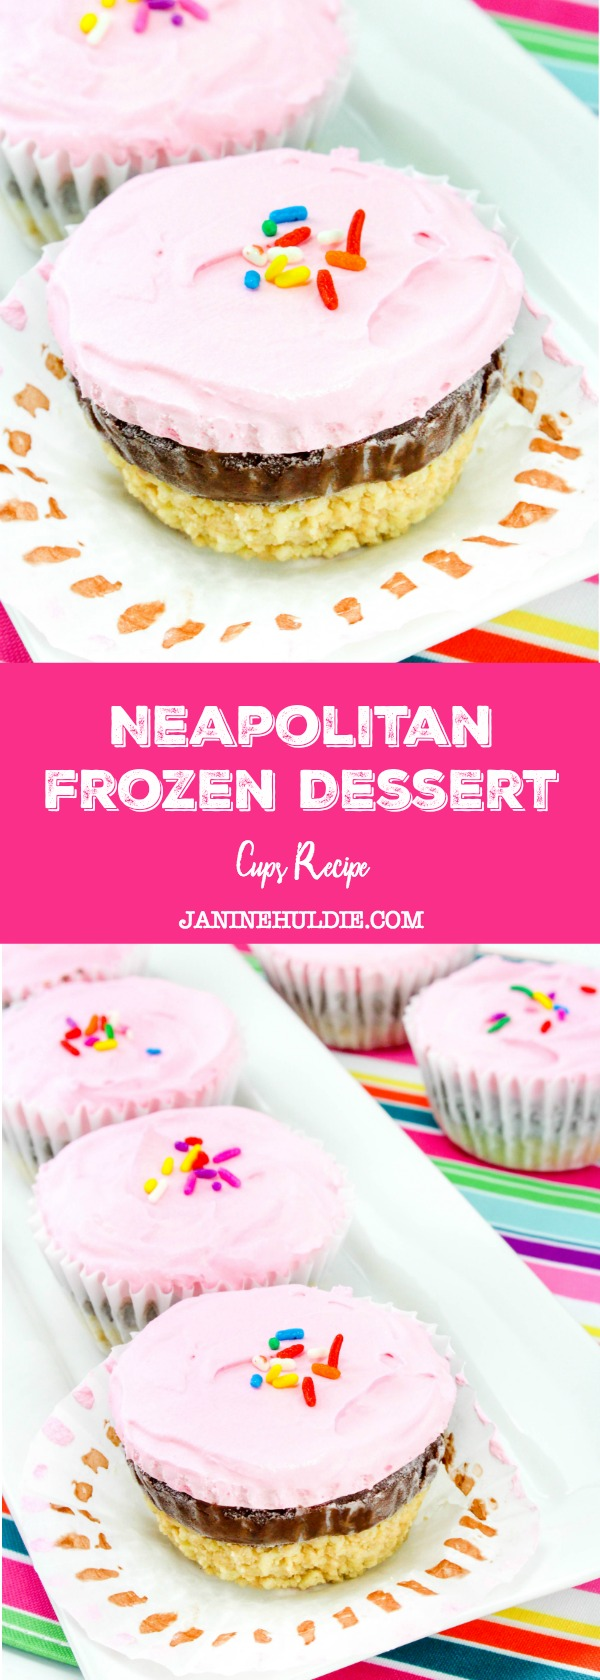 Neapolitan Frozen Dessert Cups Recipe